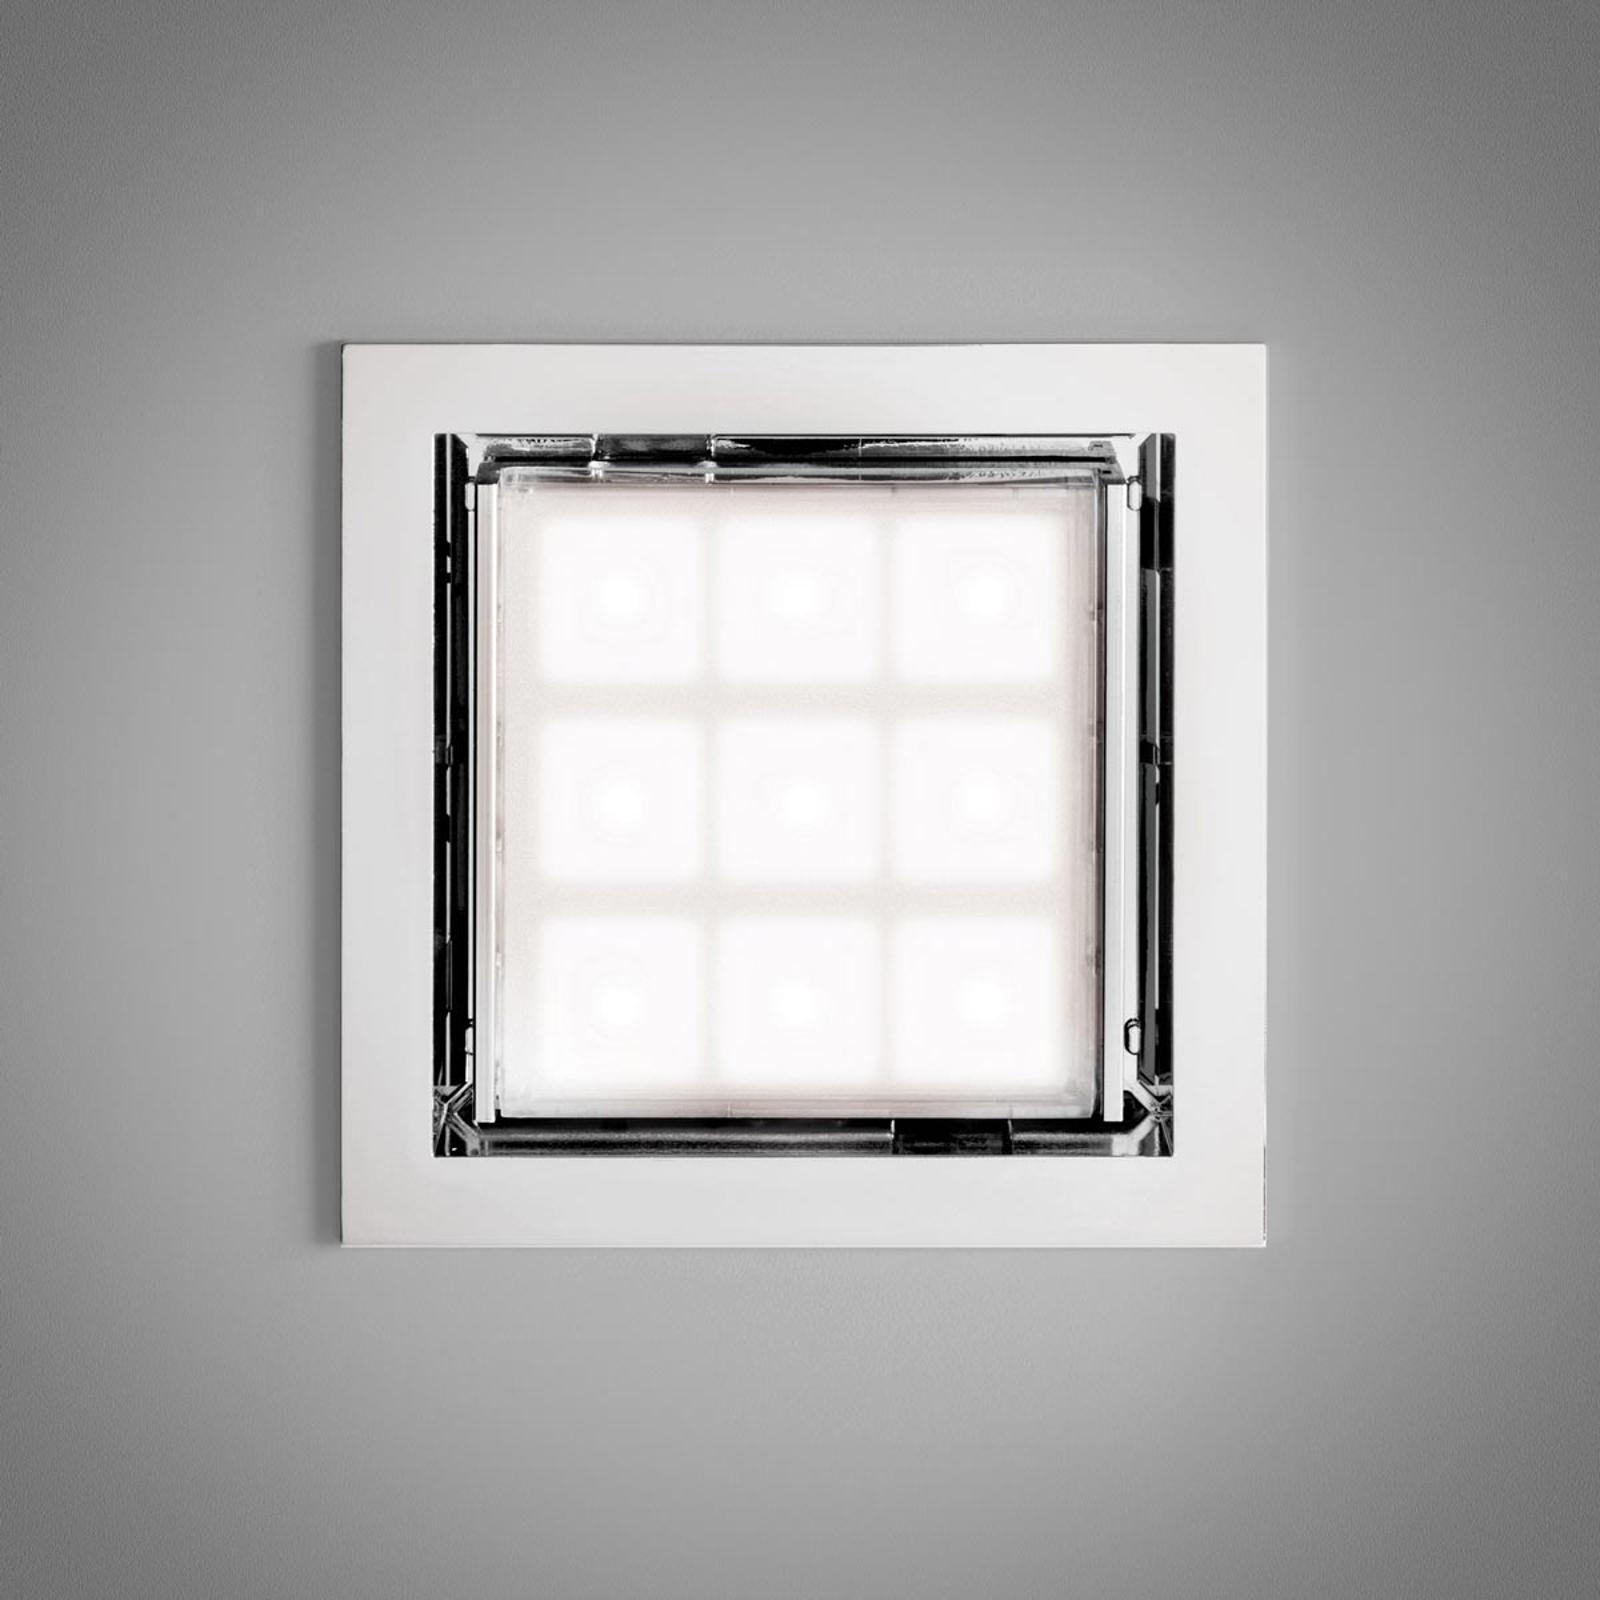 Artemide PAD80 - LED-Deckenleuchte